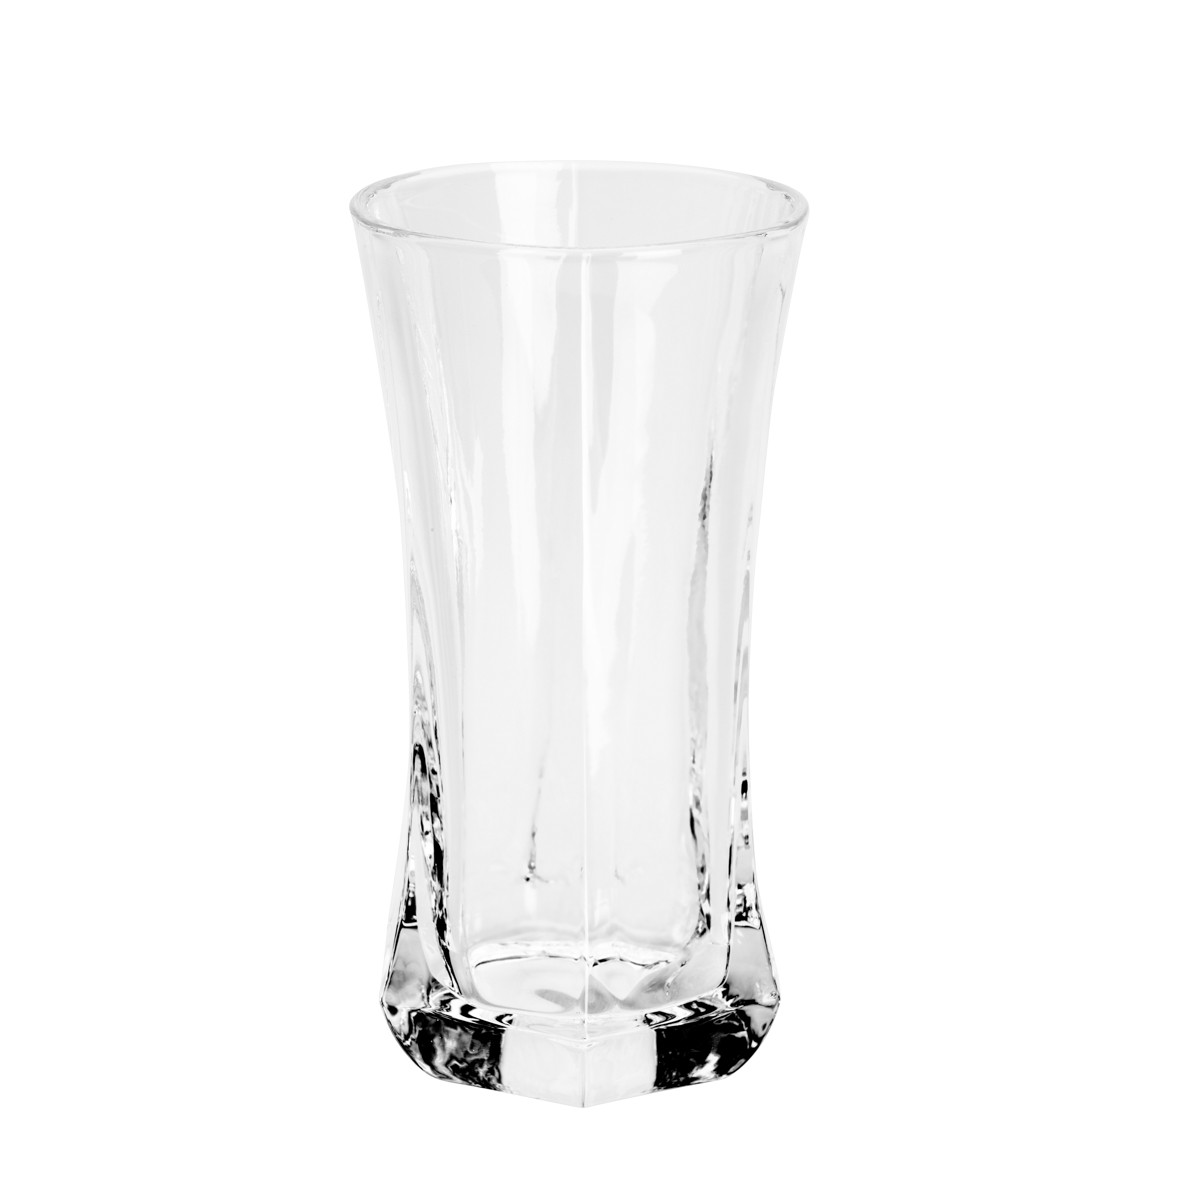 Jogo 6 copos 250ml altos para whisky cristal Galaxy Wolff - 26134